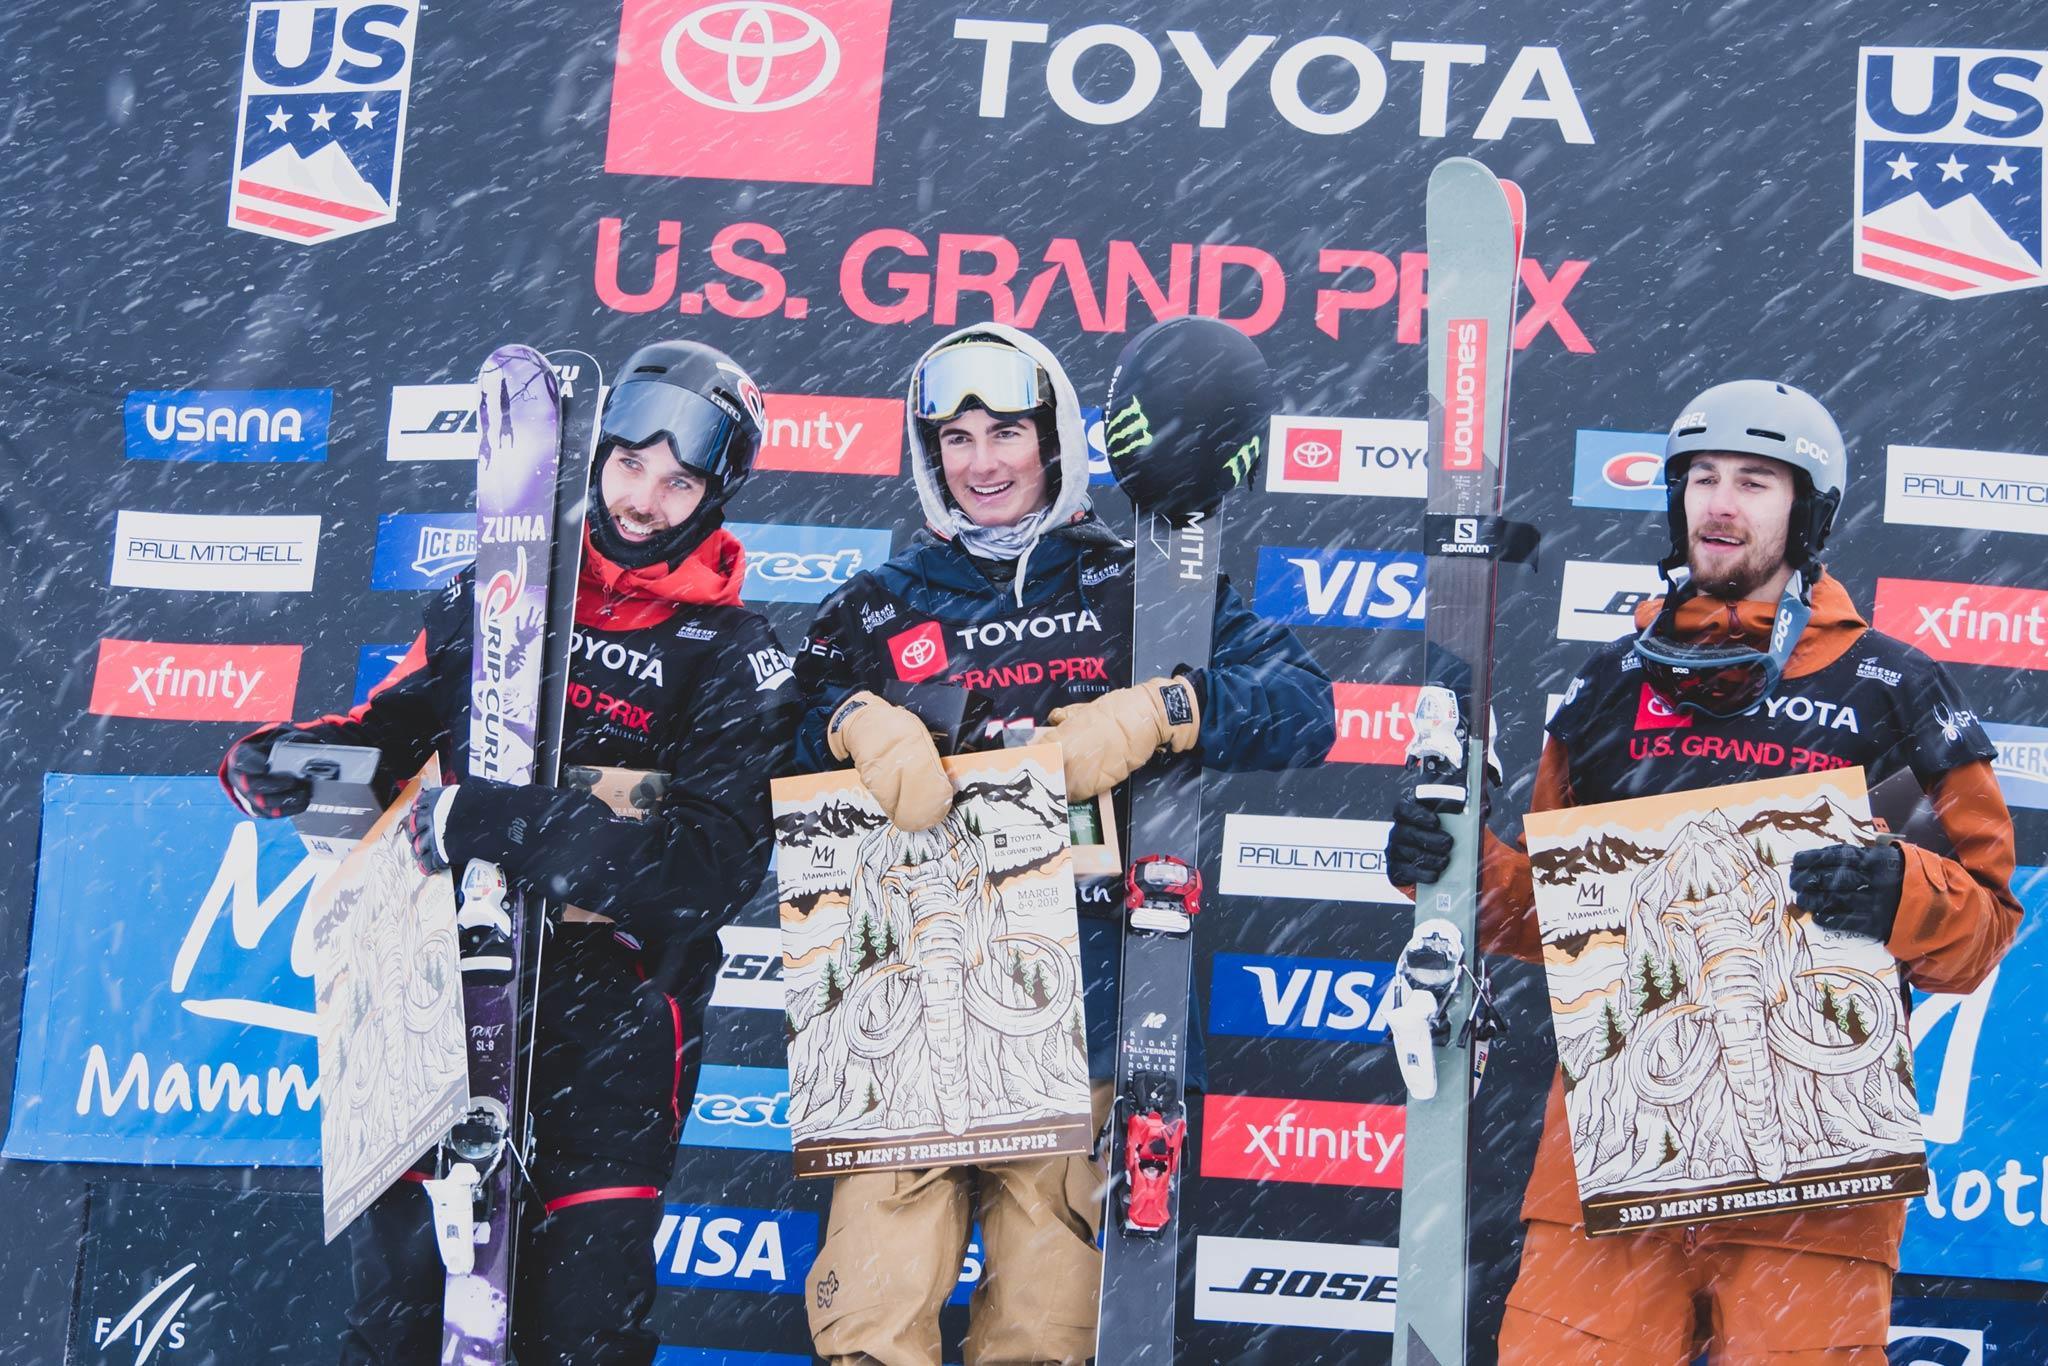 Die drei besten Männer beim FIS Freestyle Halfpipe World Cup 18/19 in Mammoth Mountain (USA): Simon D'Artois (CAN), Birk Irving (USA), Thomas Krief (FRA) – Foto: FIS Freestyle